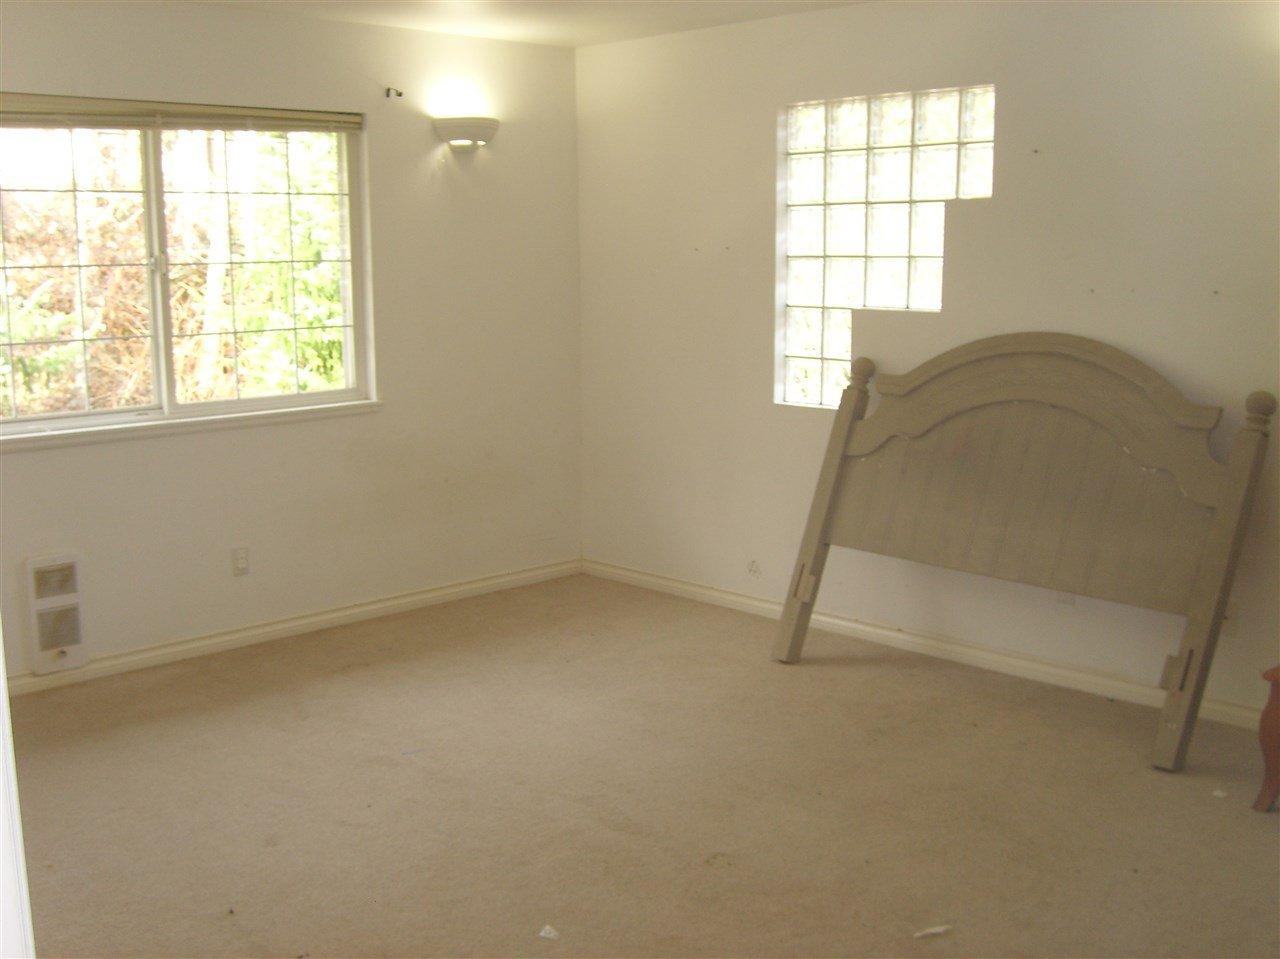 Photo 10: Photos: 28640 123 Avenue in Maple Ridge: Northeast House for sale : MLS®# R2419989